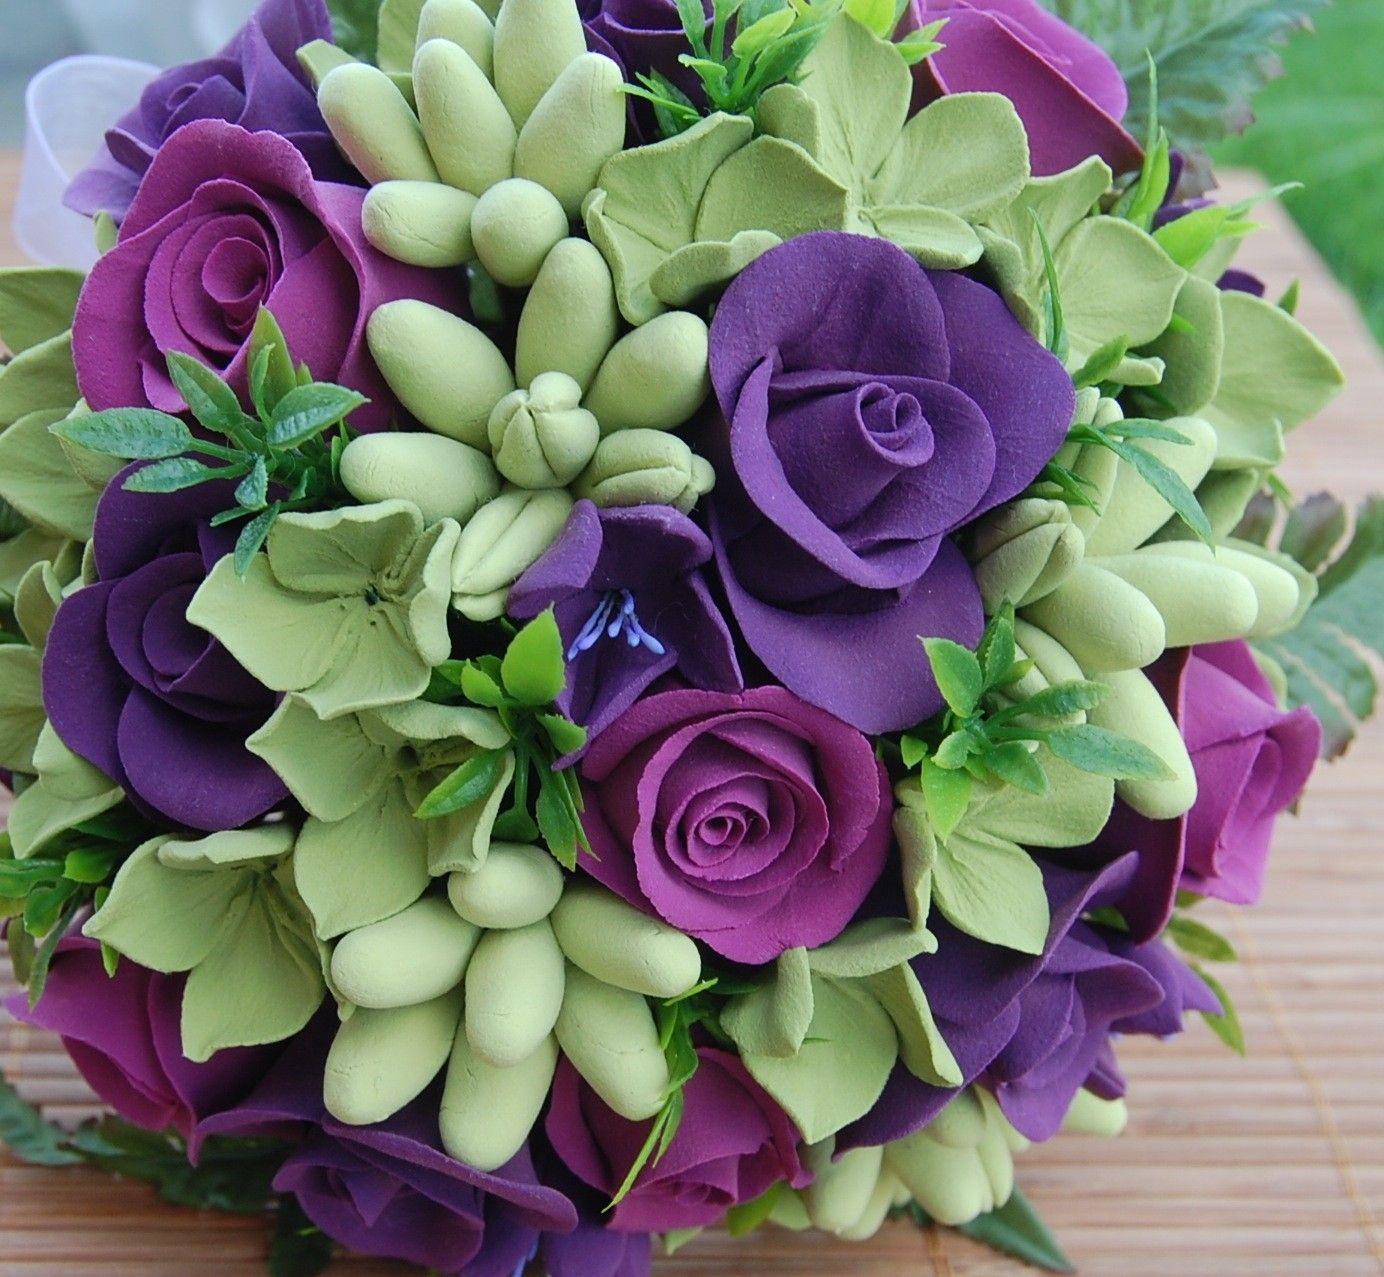 Bouquets Bouquets Etc Pinterest Purple Roses Hydrangea And Limes